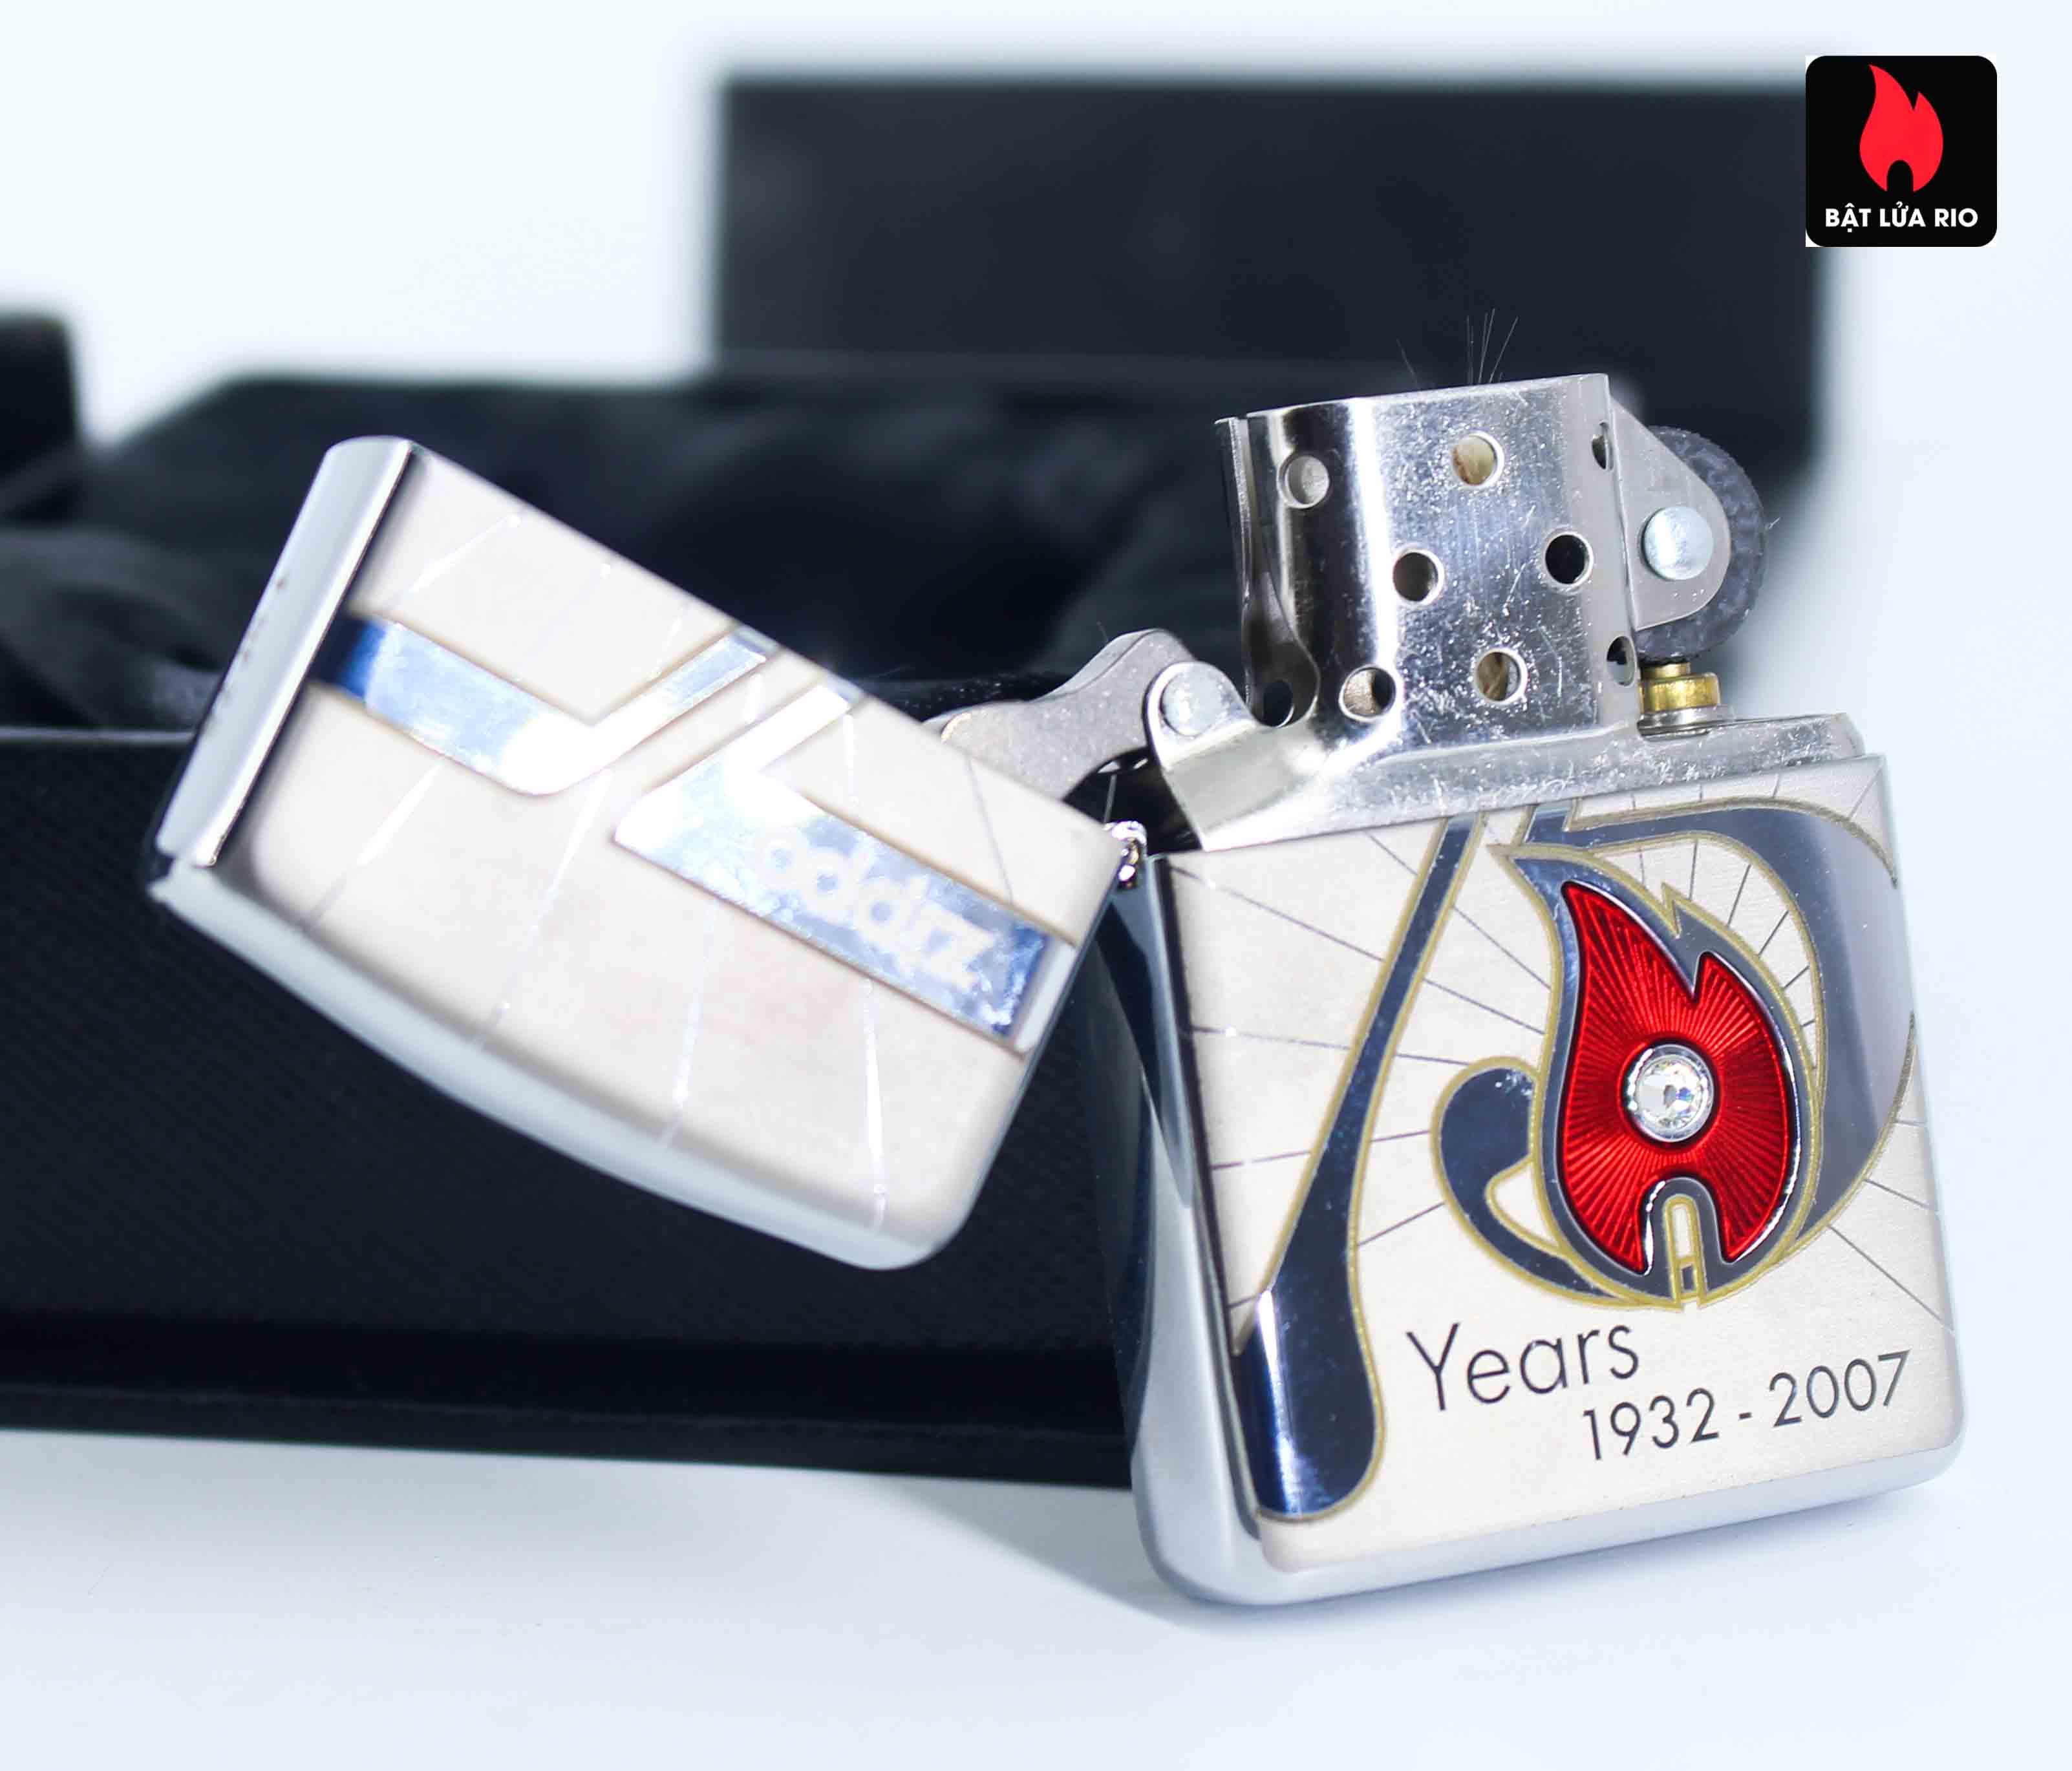 Zippo 2007 – 75th Anniversary Edition – Lào – Limited LAO 1 Of 75 8